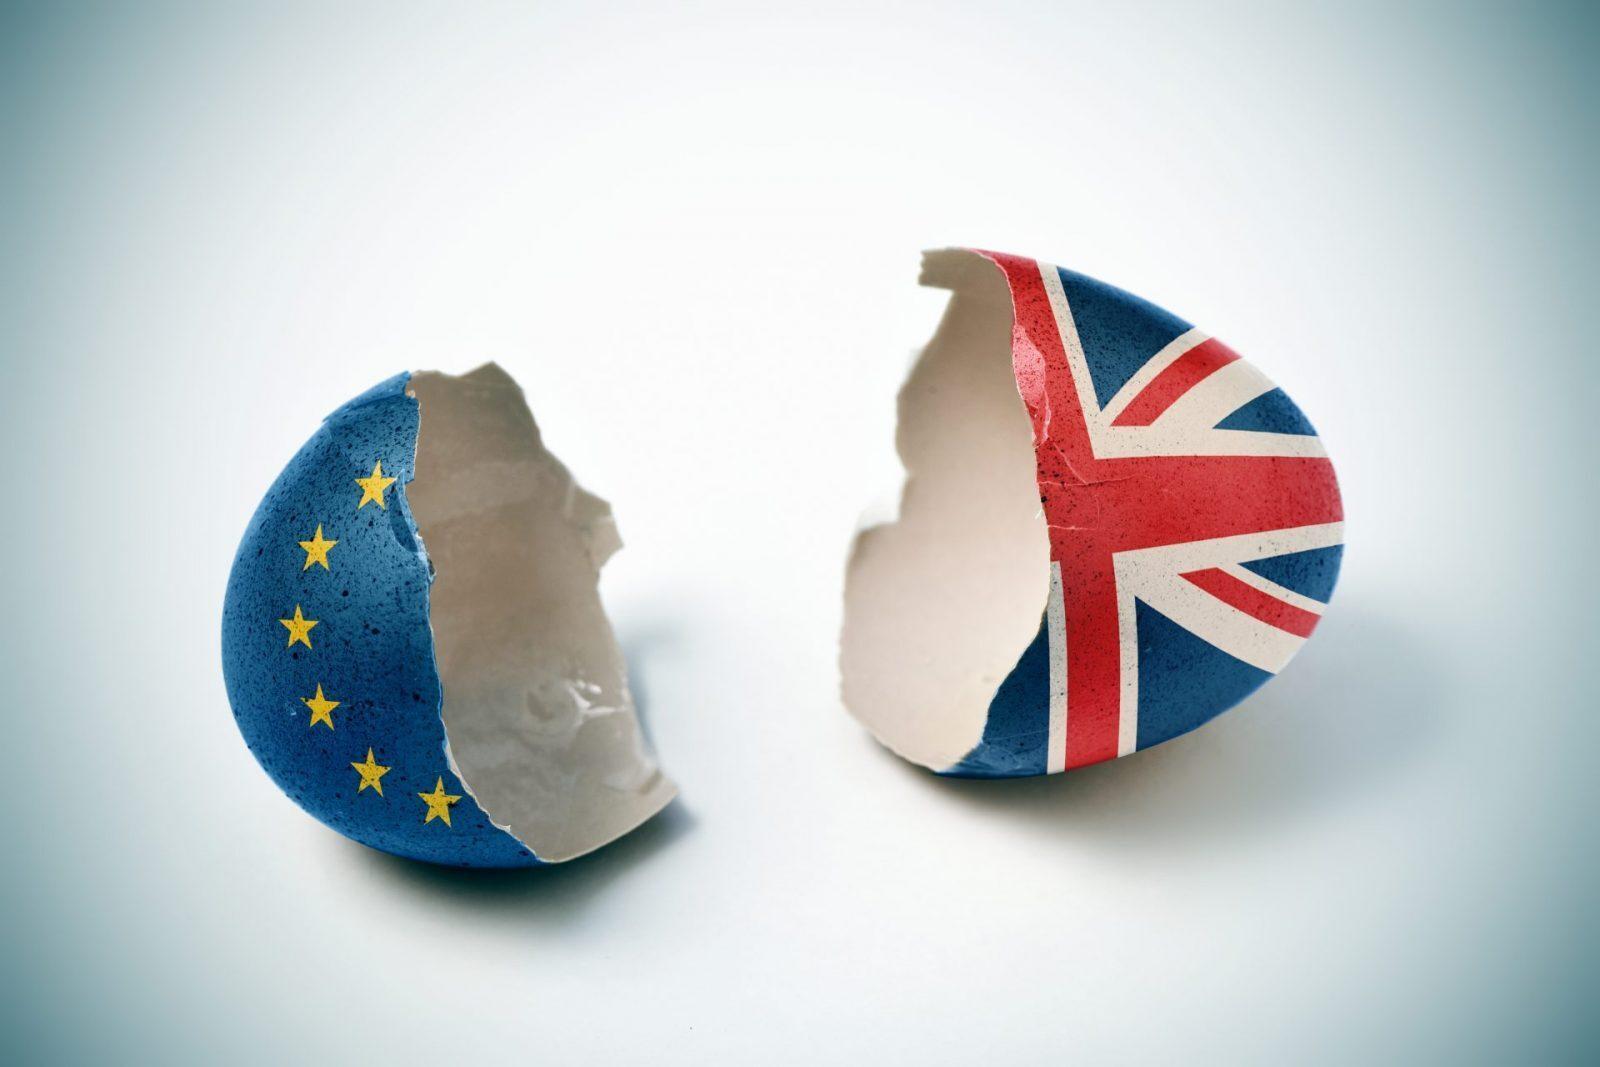 Brexit turbulence